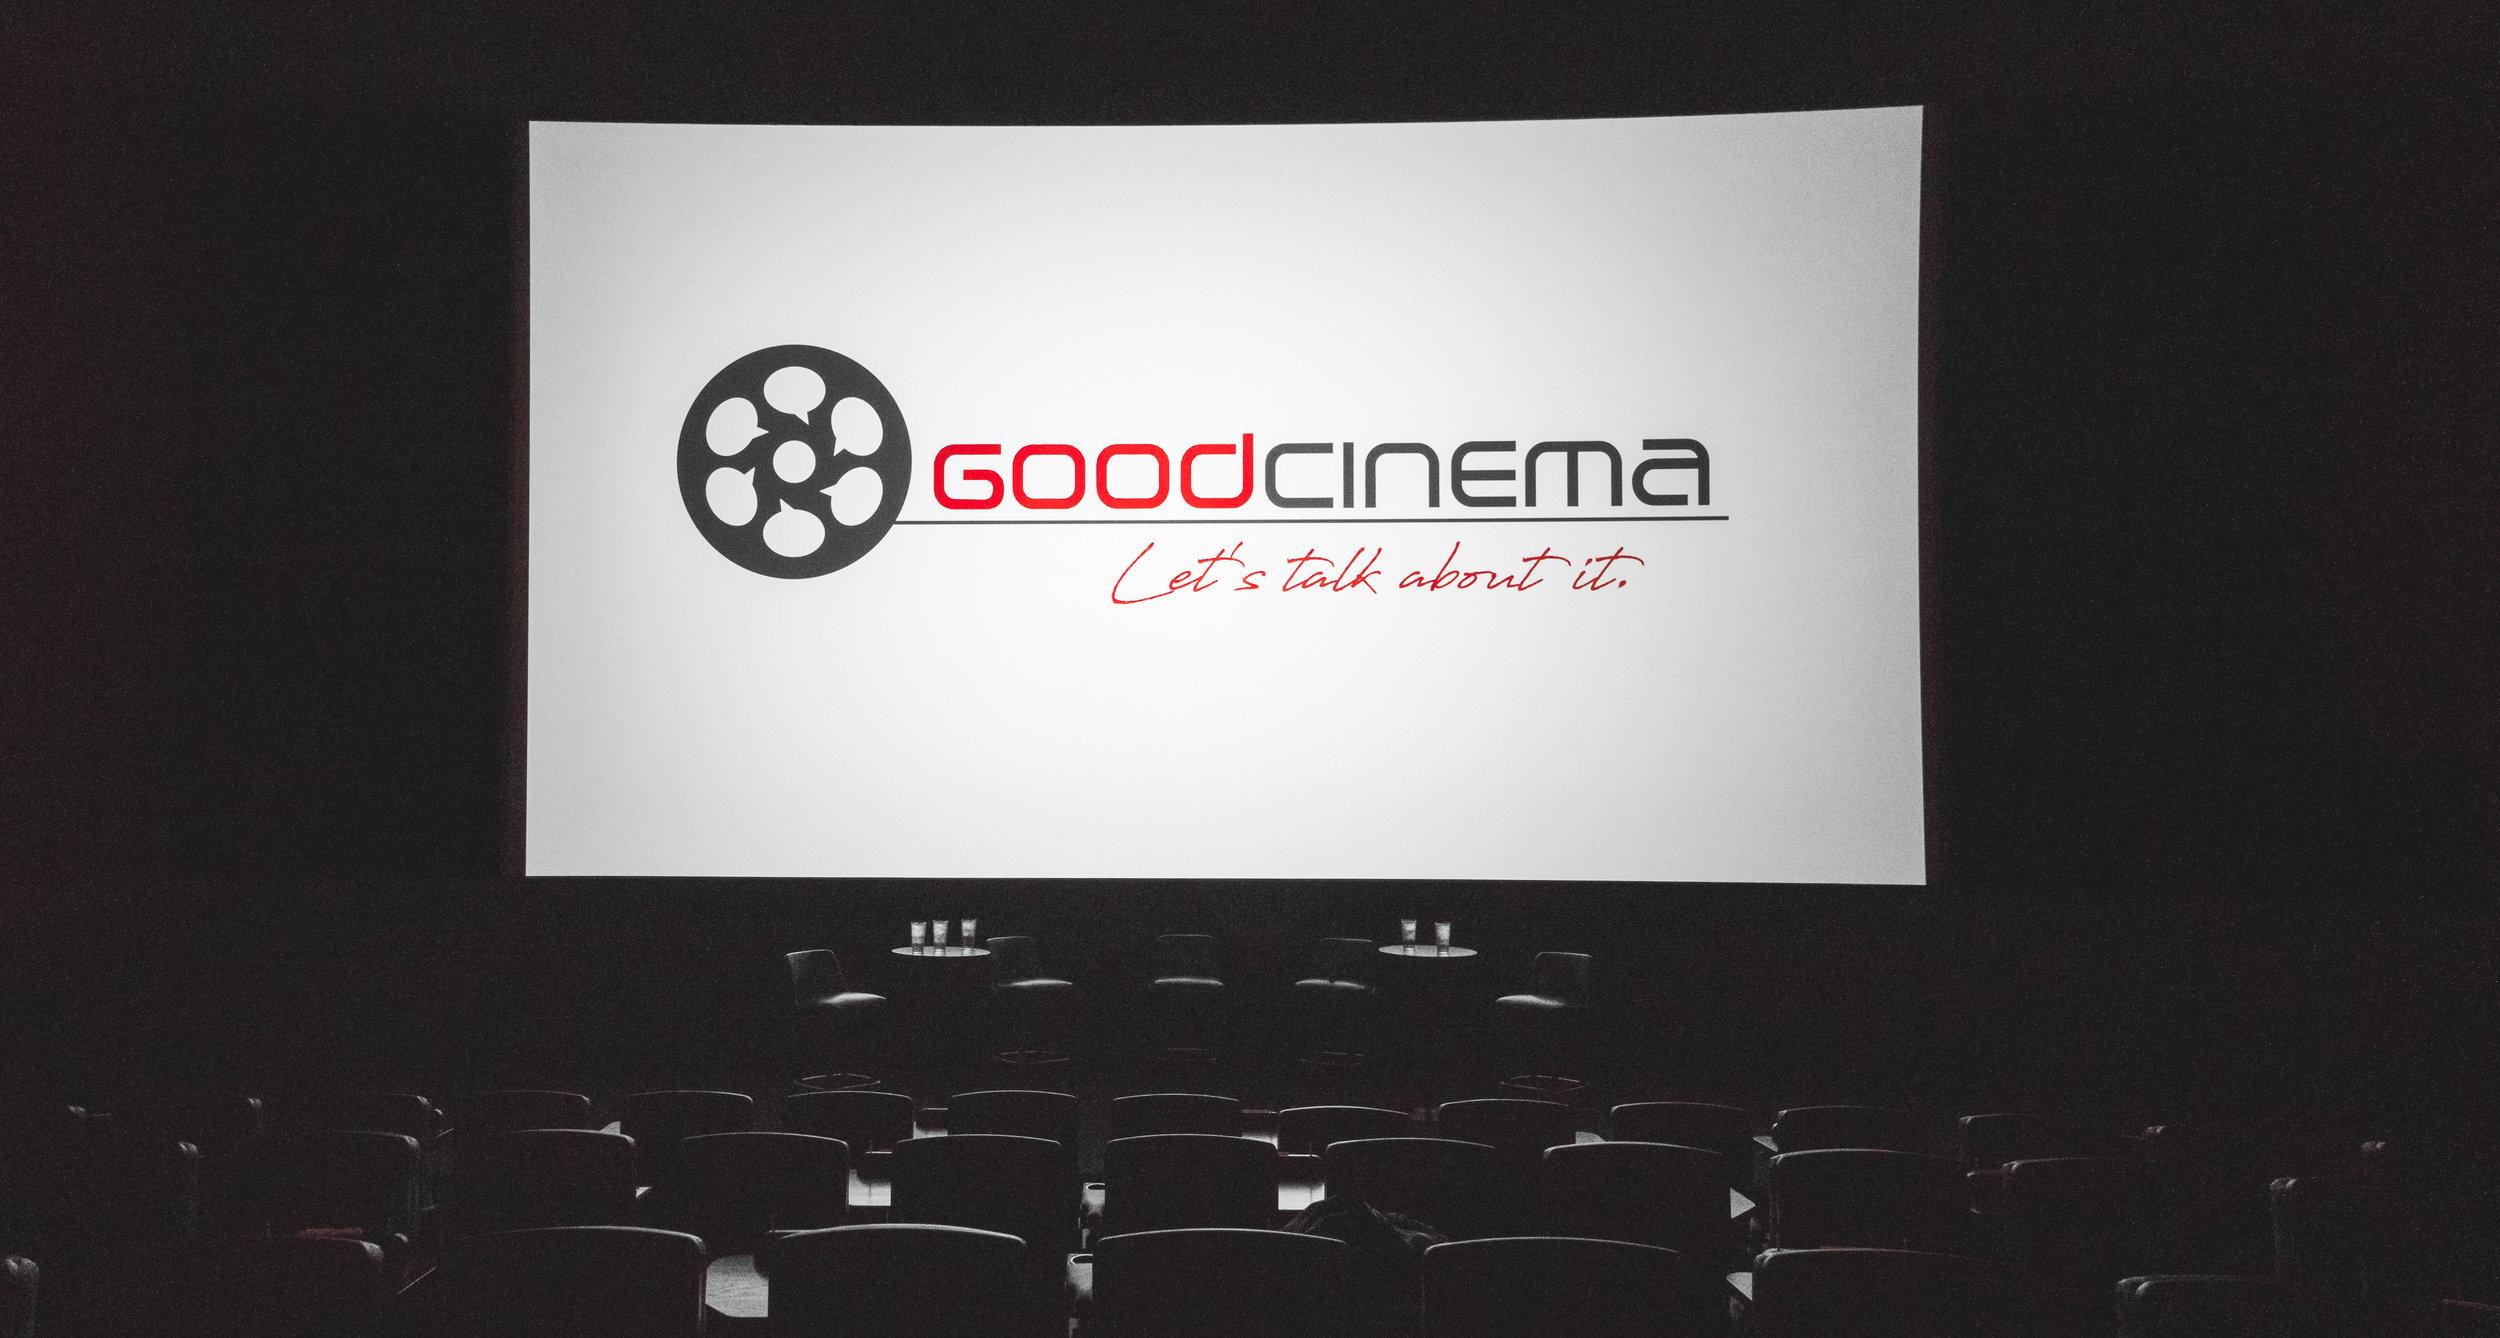 Good_Cinema_Lifted_Photography_Film-300.jpg